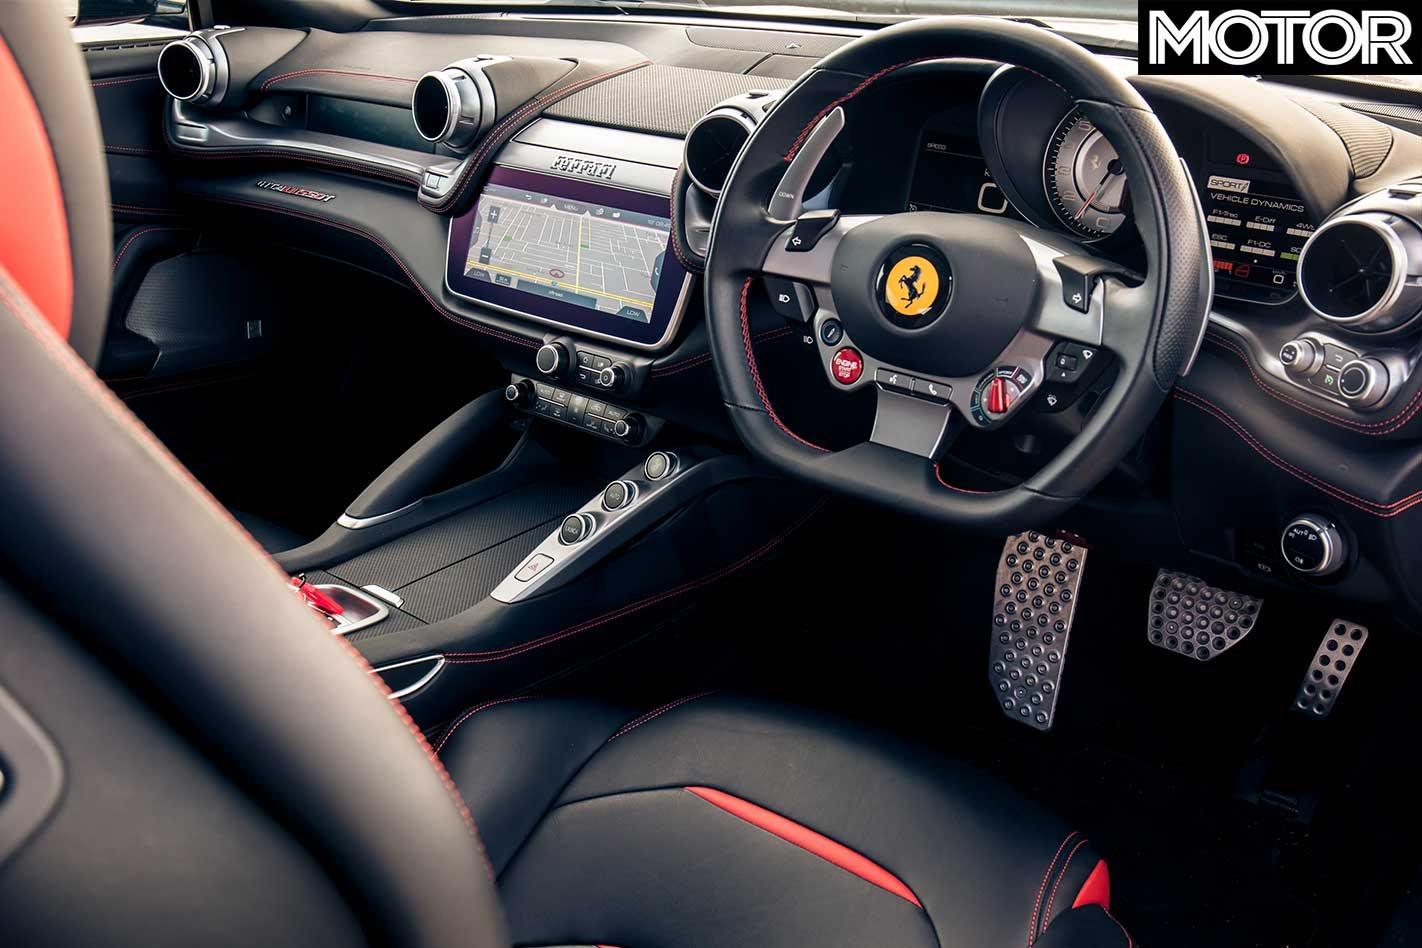 2019 Ferrari Gtc4lusso T Long Term Review Motor Magazine